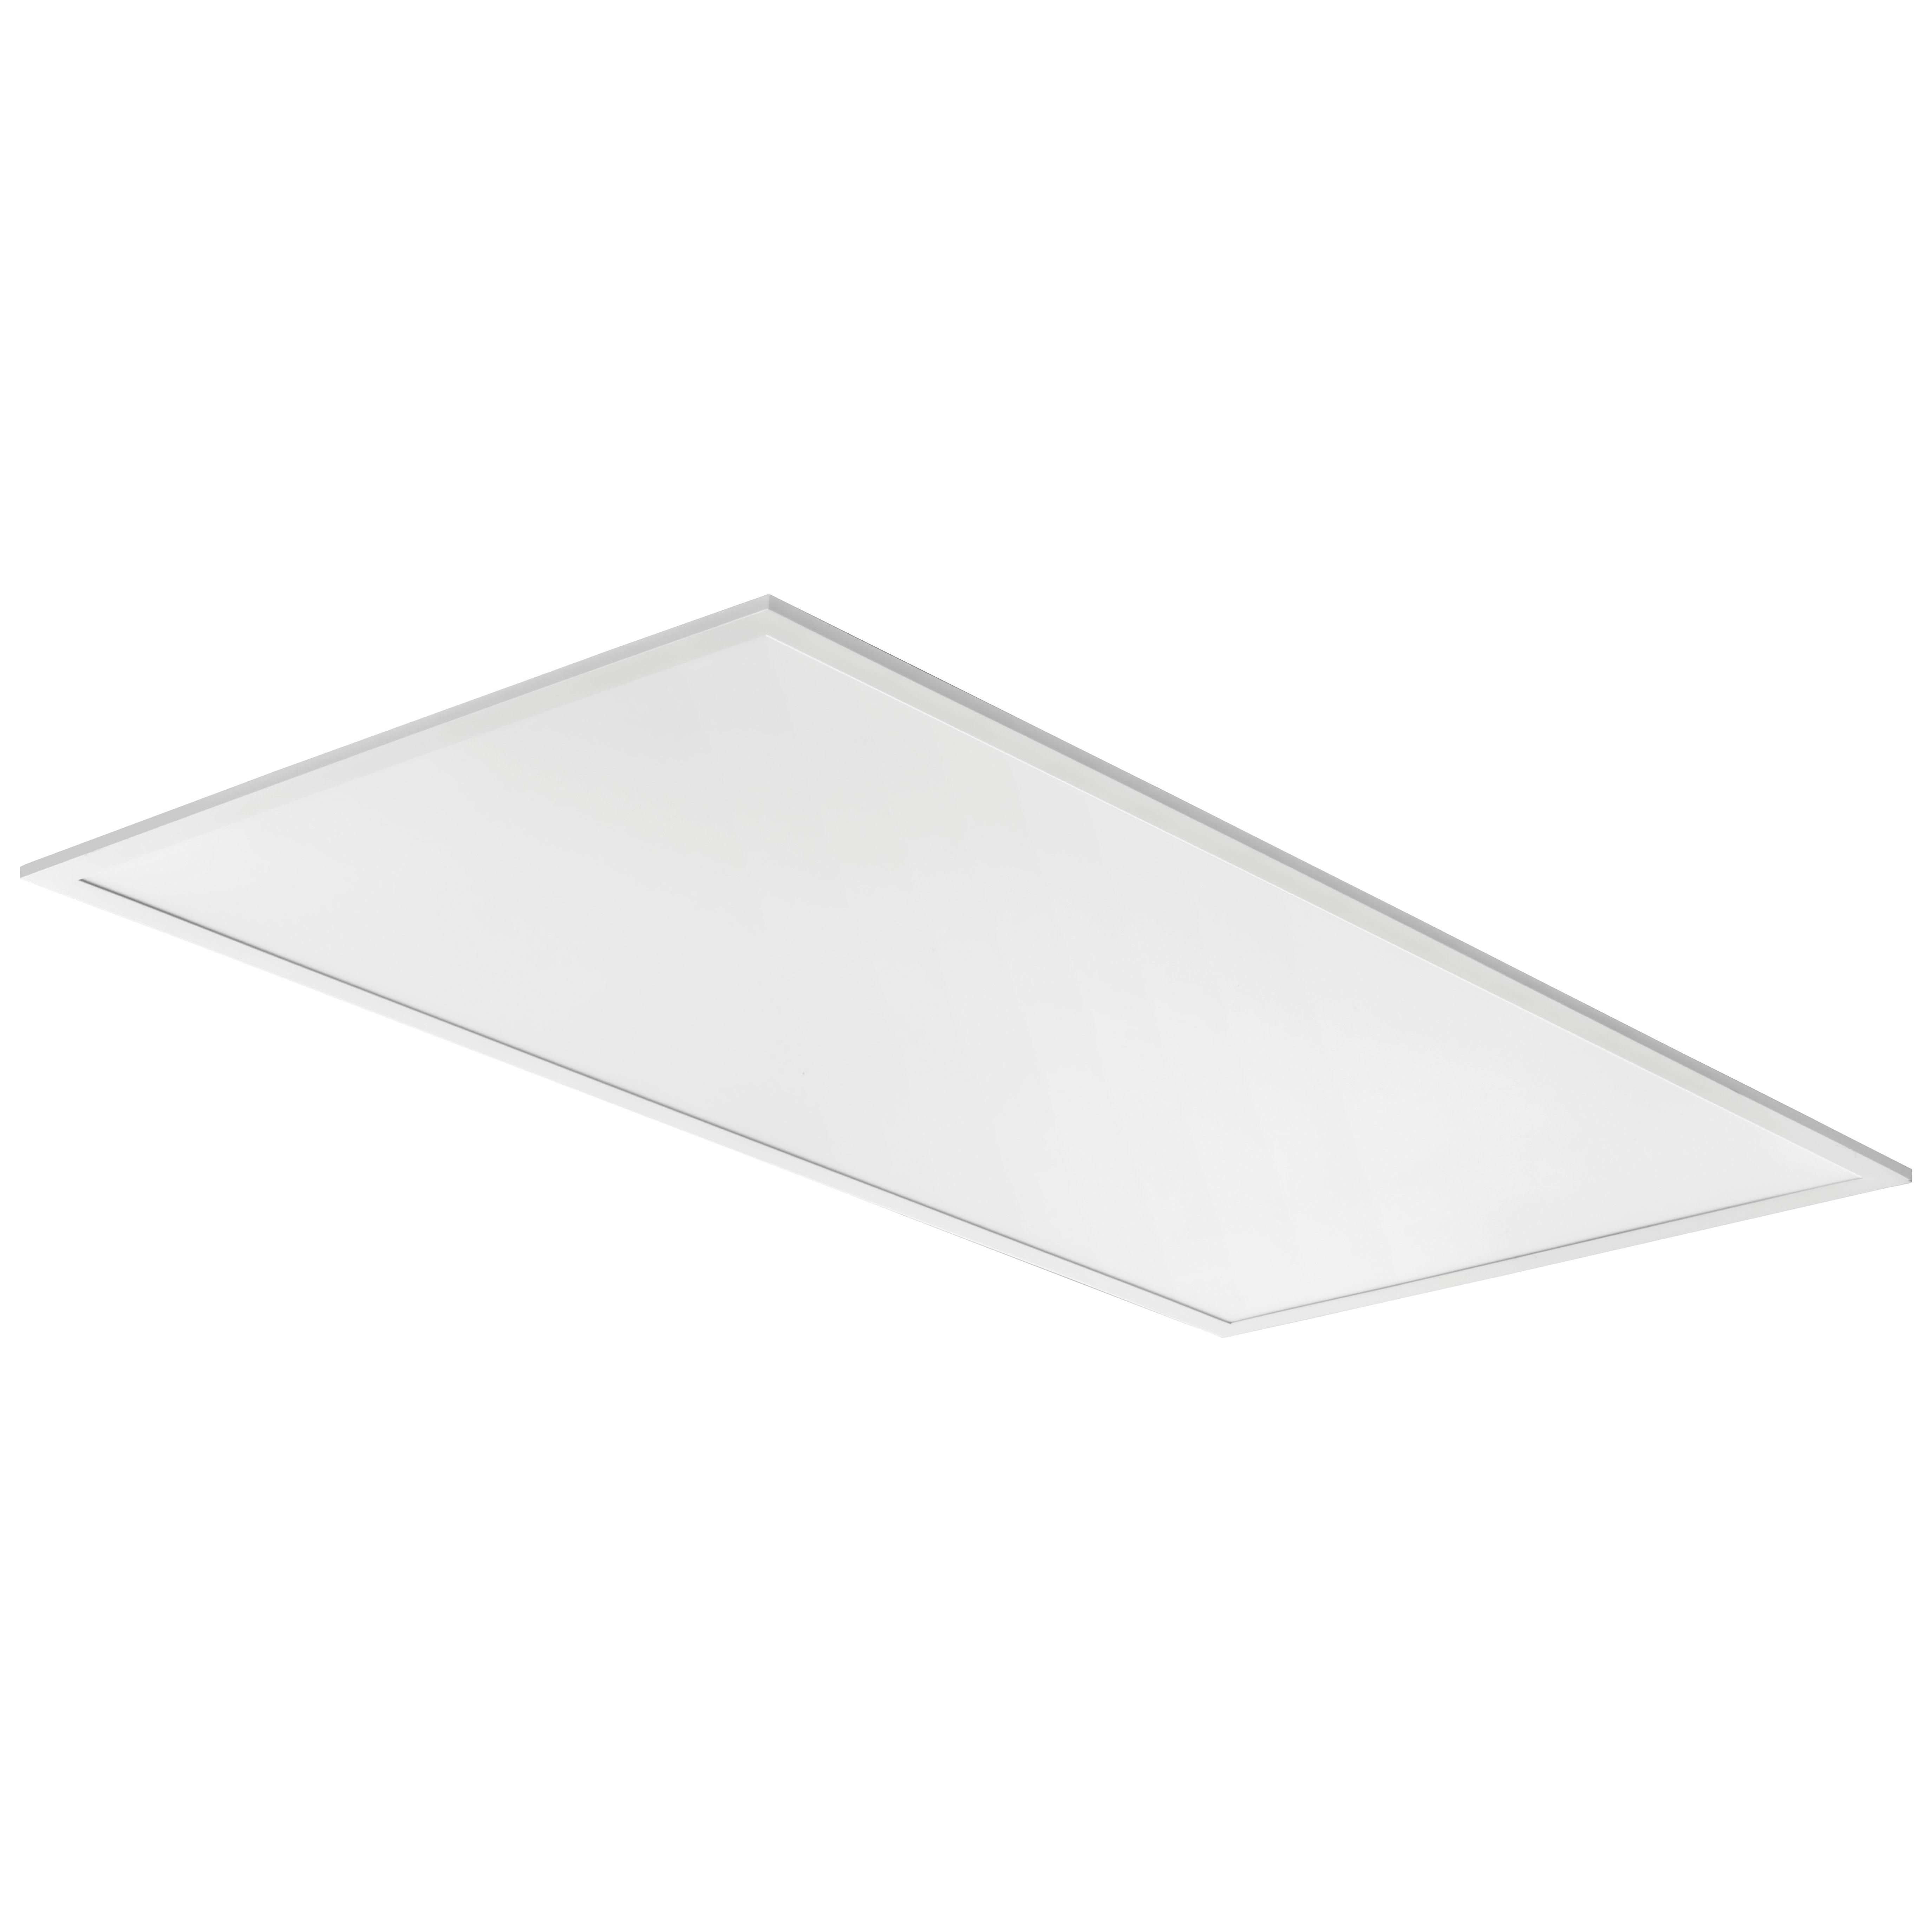 Lithonia Lighting®CPX 2X4 ALO8 SWW7 M2